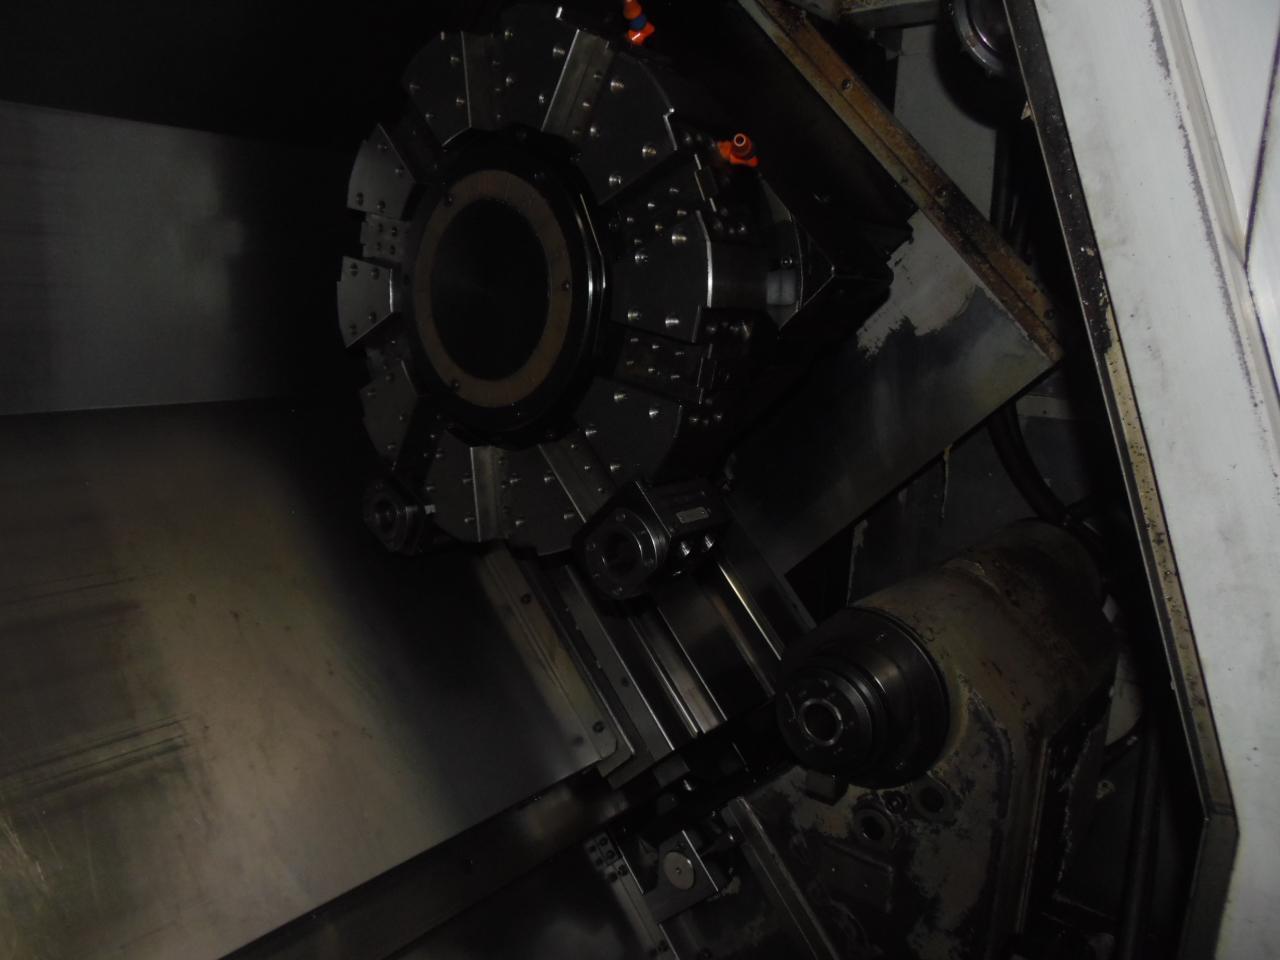 "MORI SEIKI SL-300B/700, FANUC 18iT CTRL, 28"" X 29""CTRS, 4"" SPINDLE BORE, 1998"